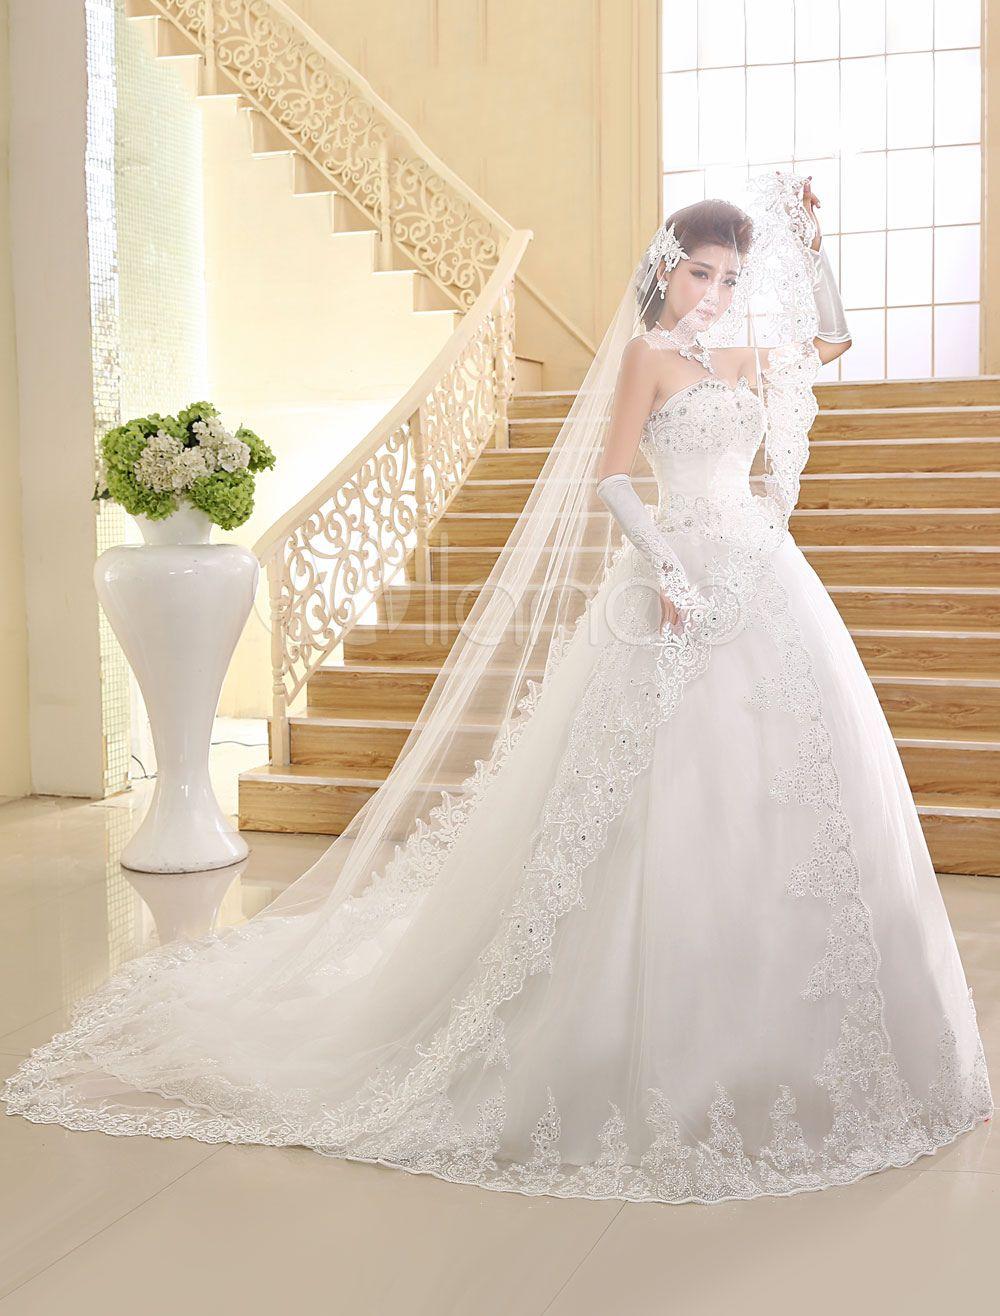 Princess Wedding Dresses Strapless Ball Gown Bridal Dress